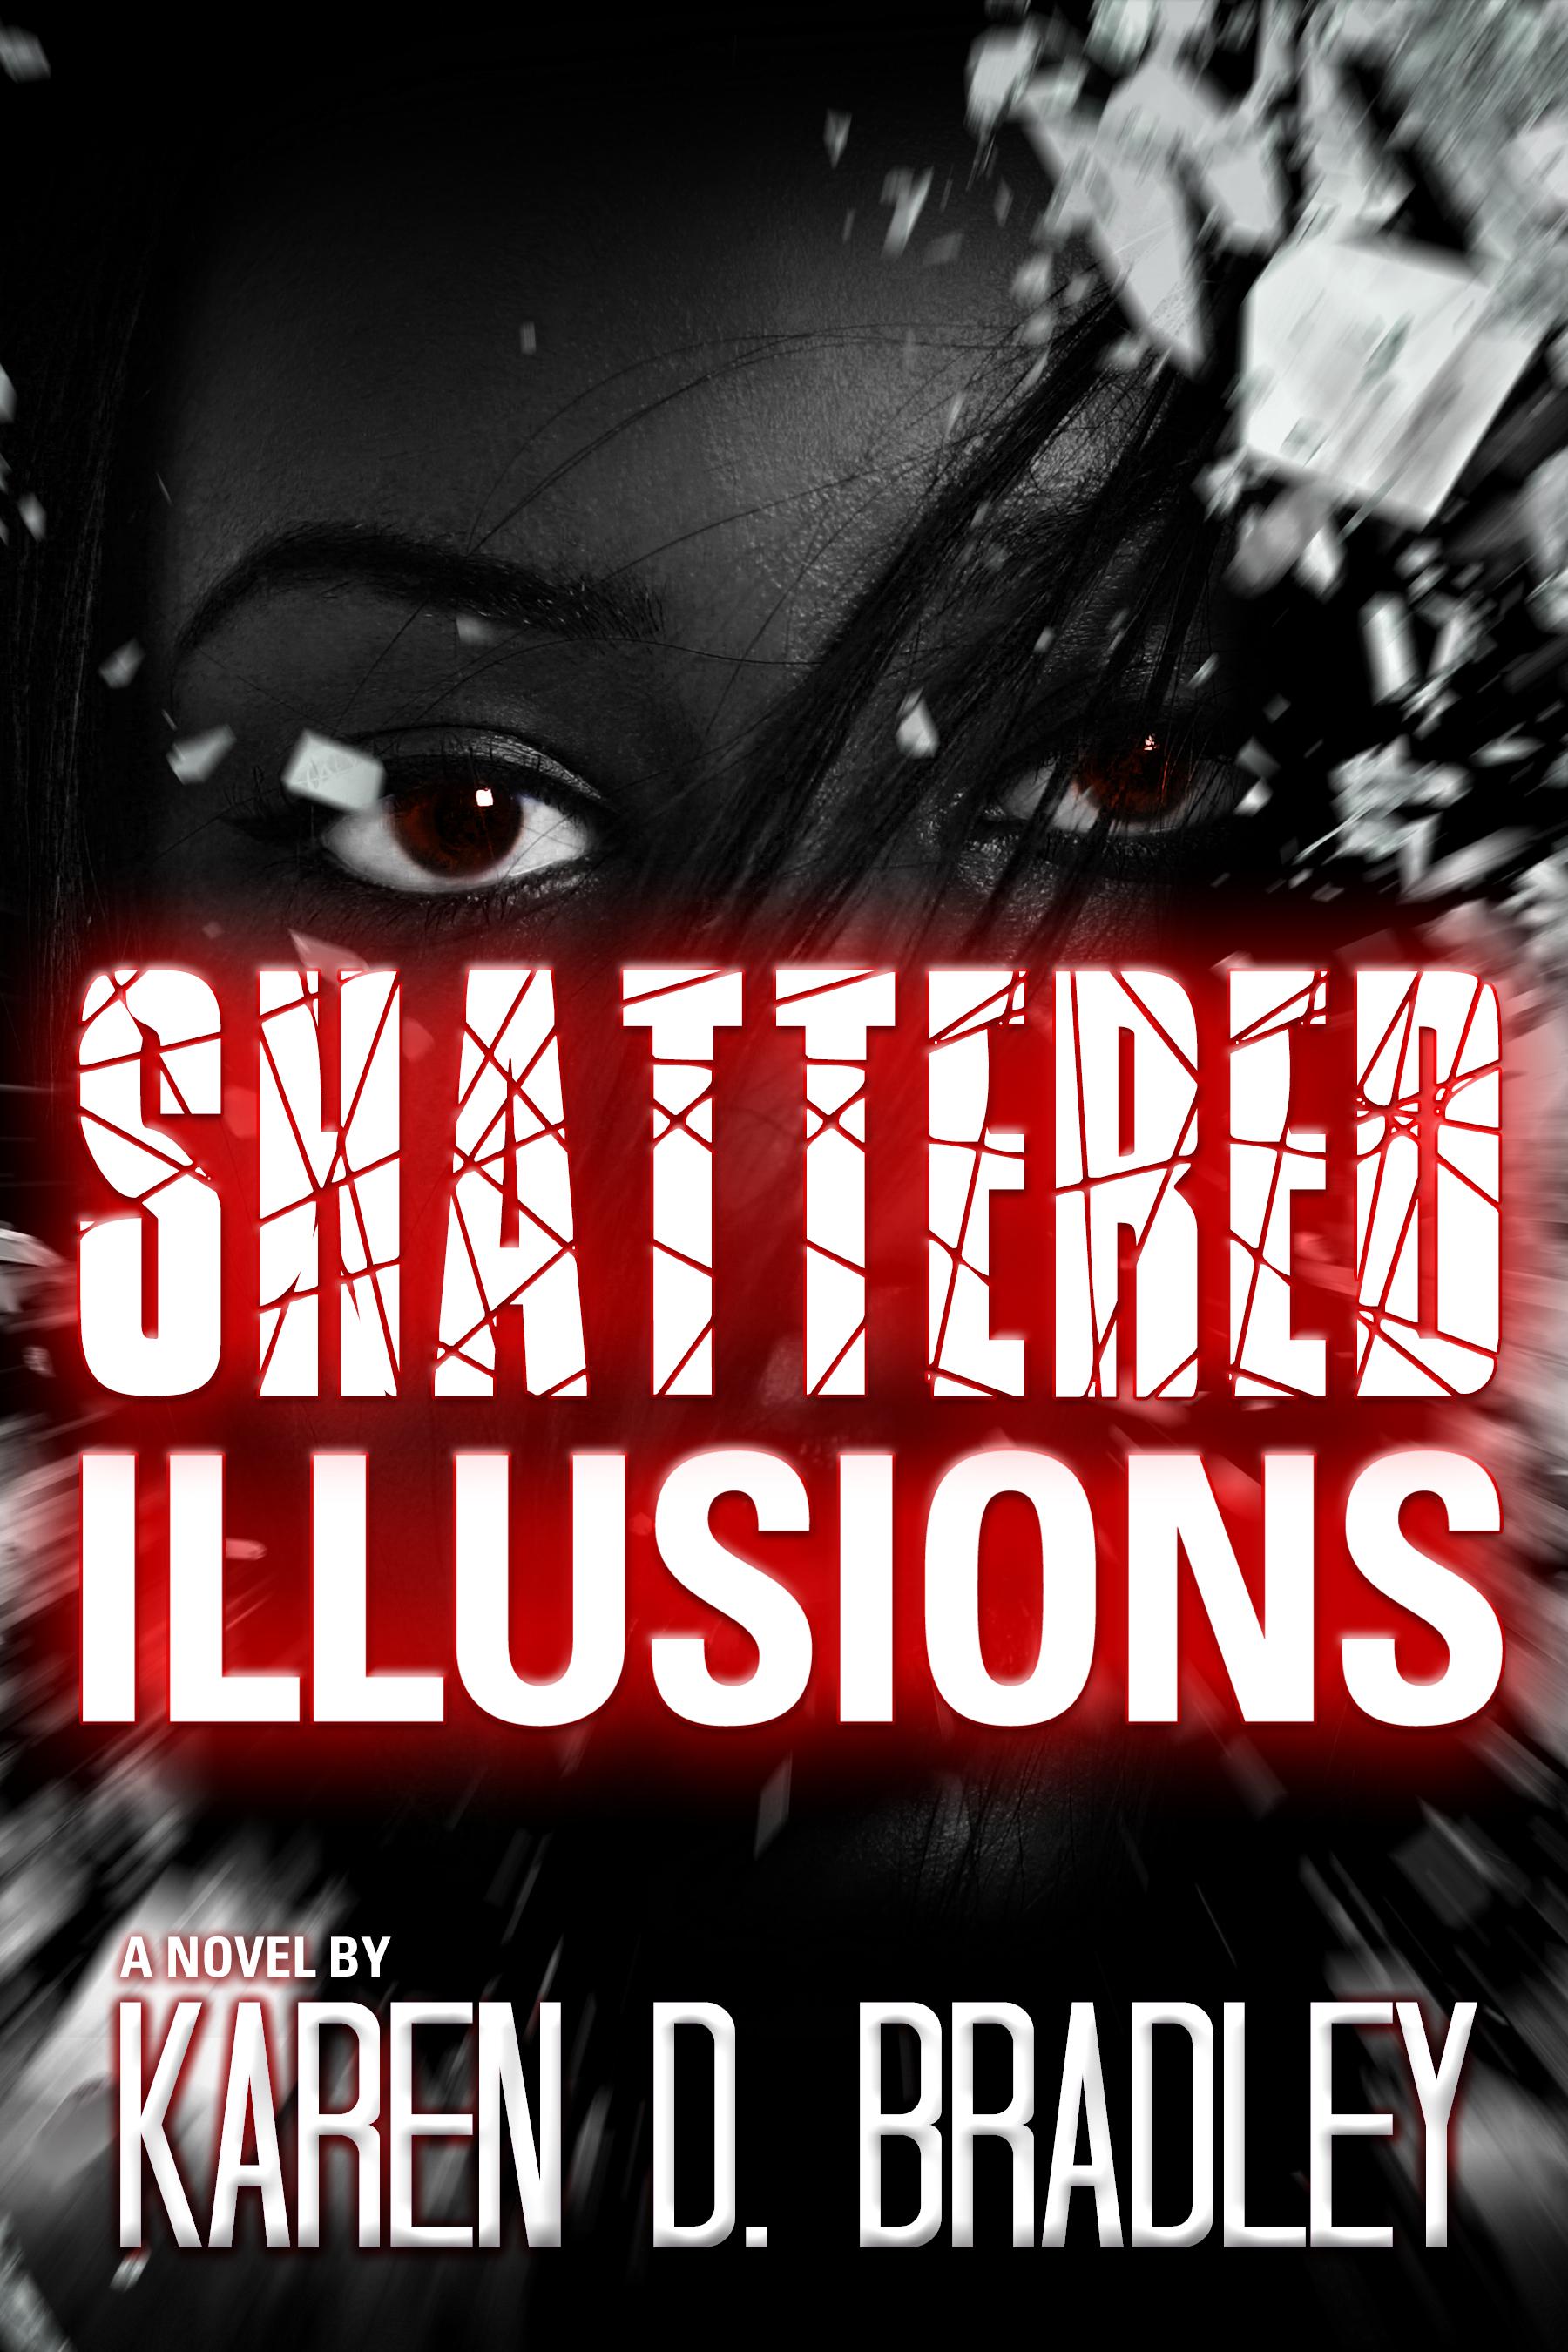 ShatteredIllusions